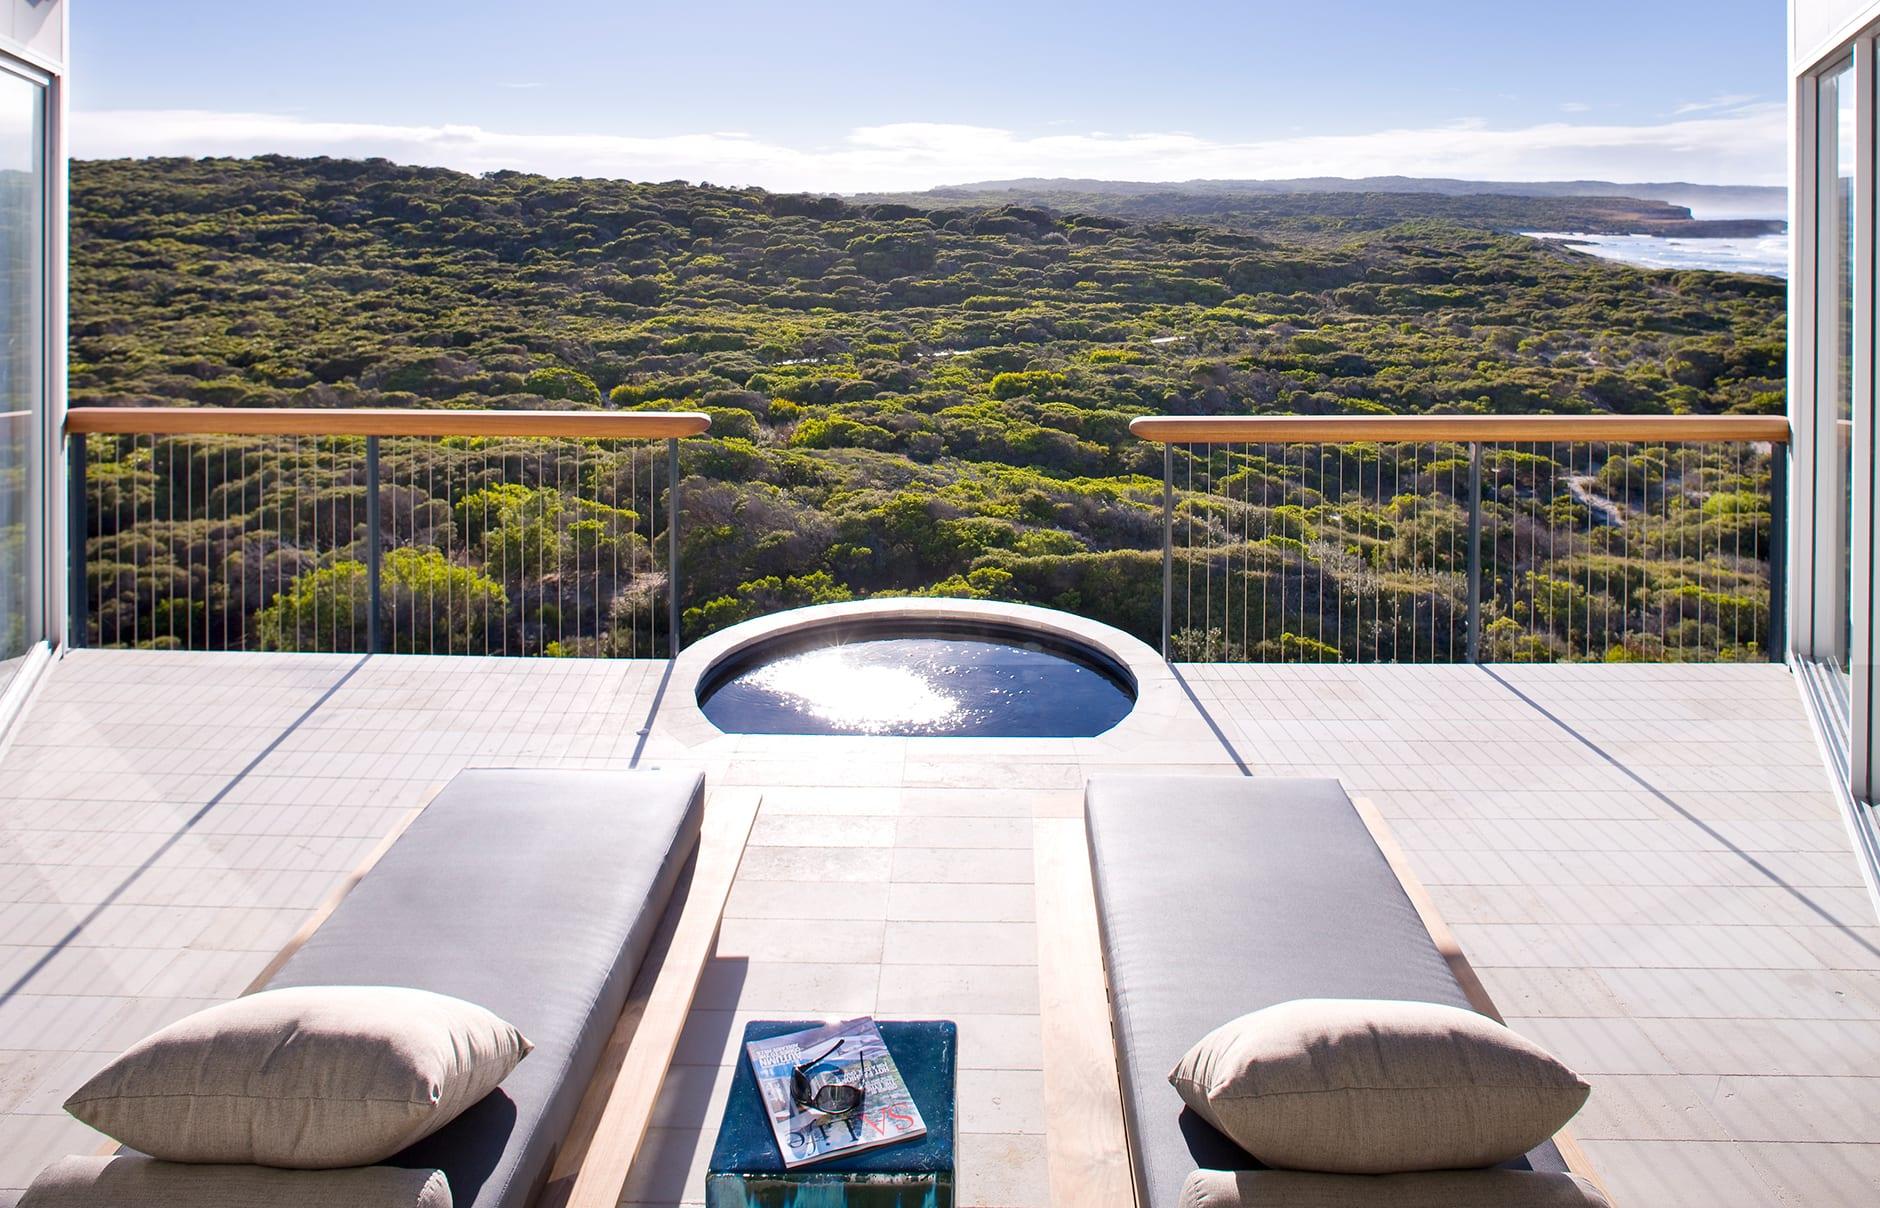 Osprey Pavilion Terrace. Southern Ocean Lodge, Kangaroo Island, Australia. © Luxury Lodges of Australia